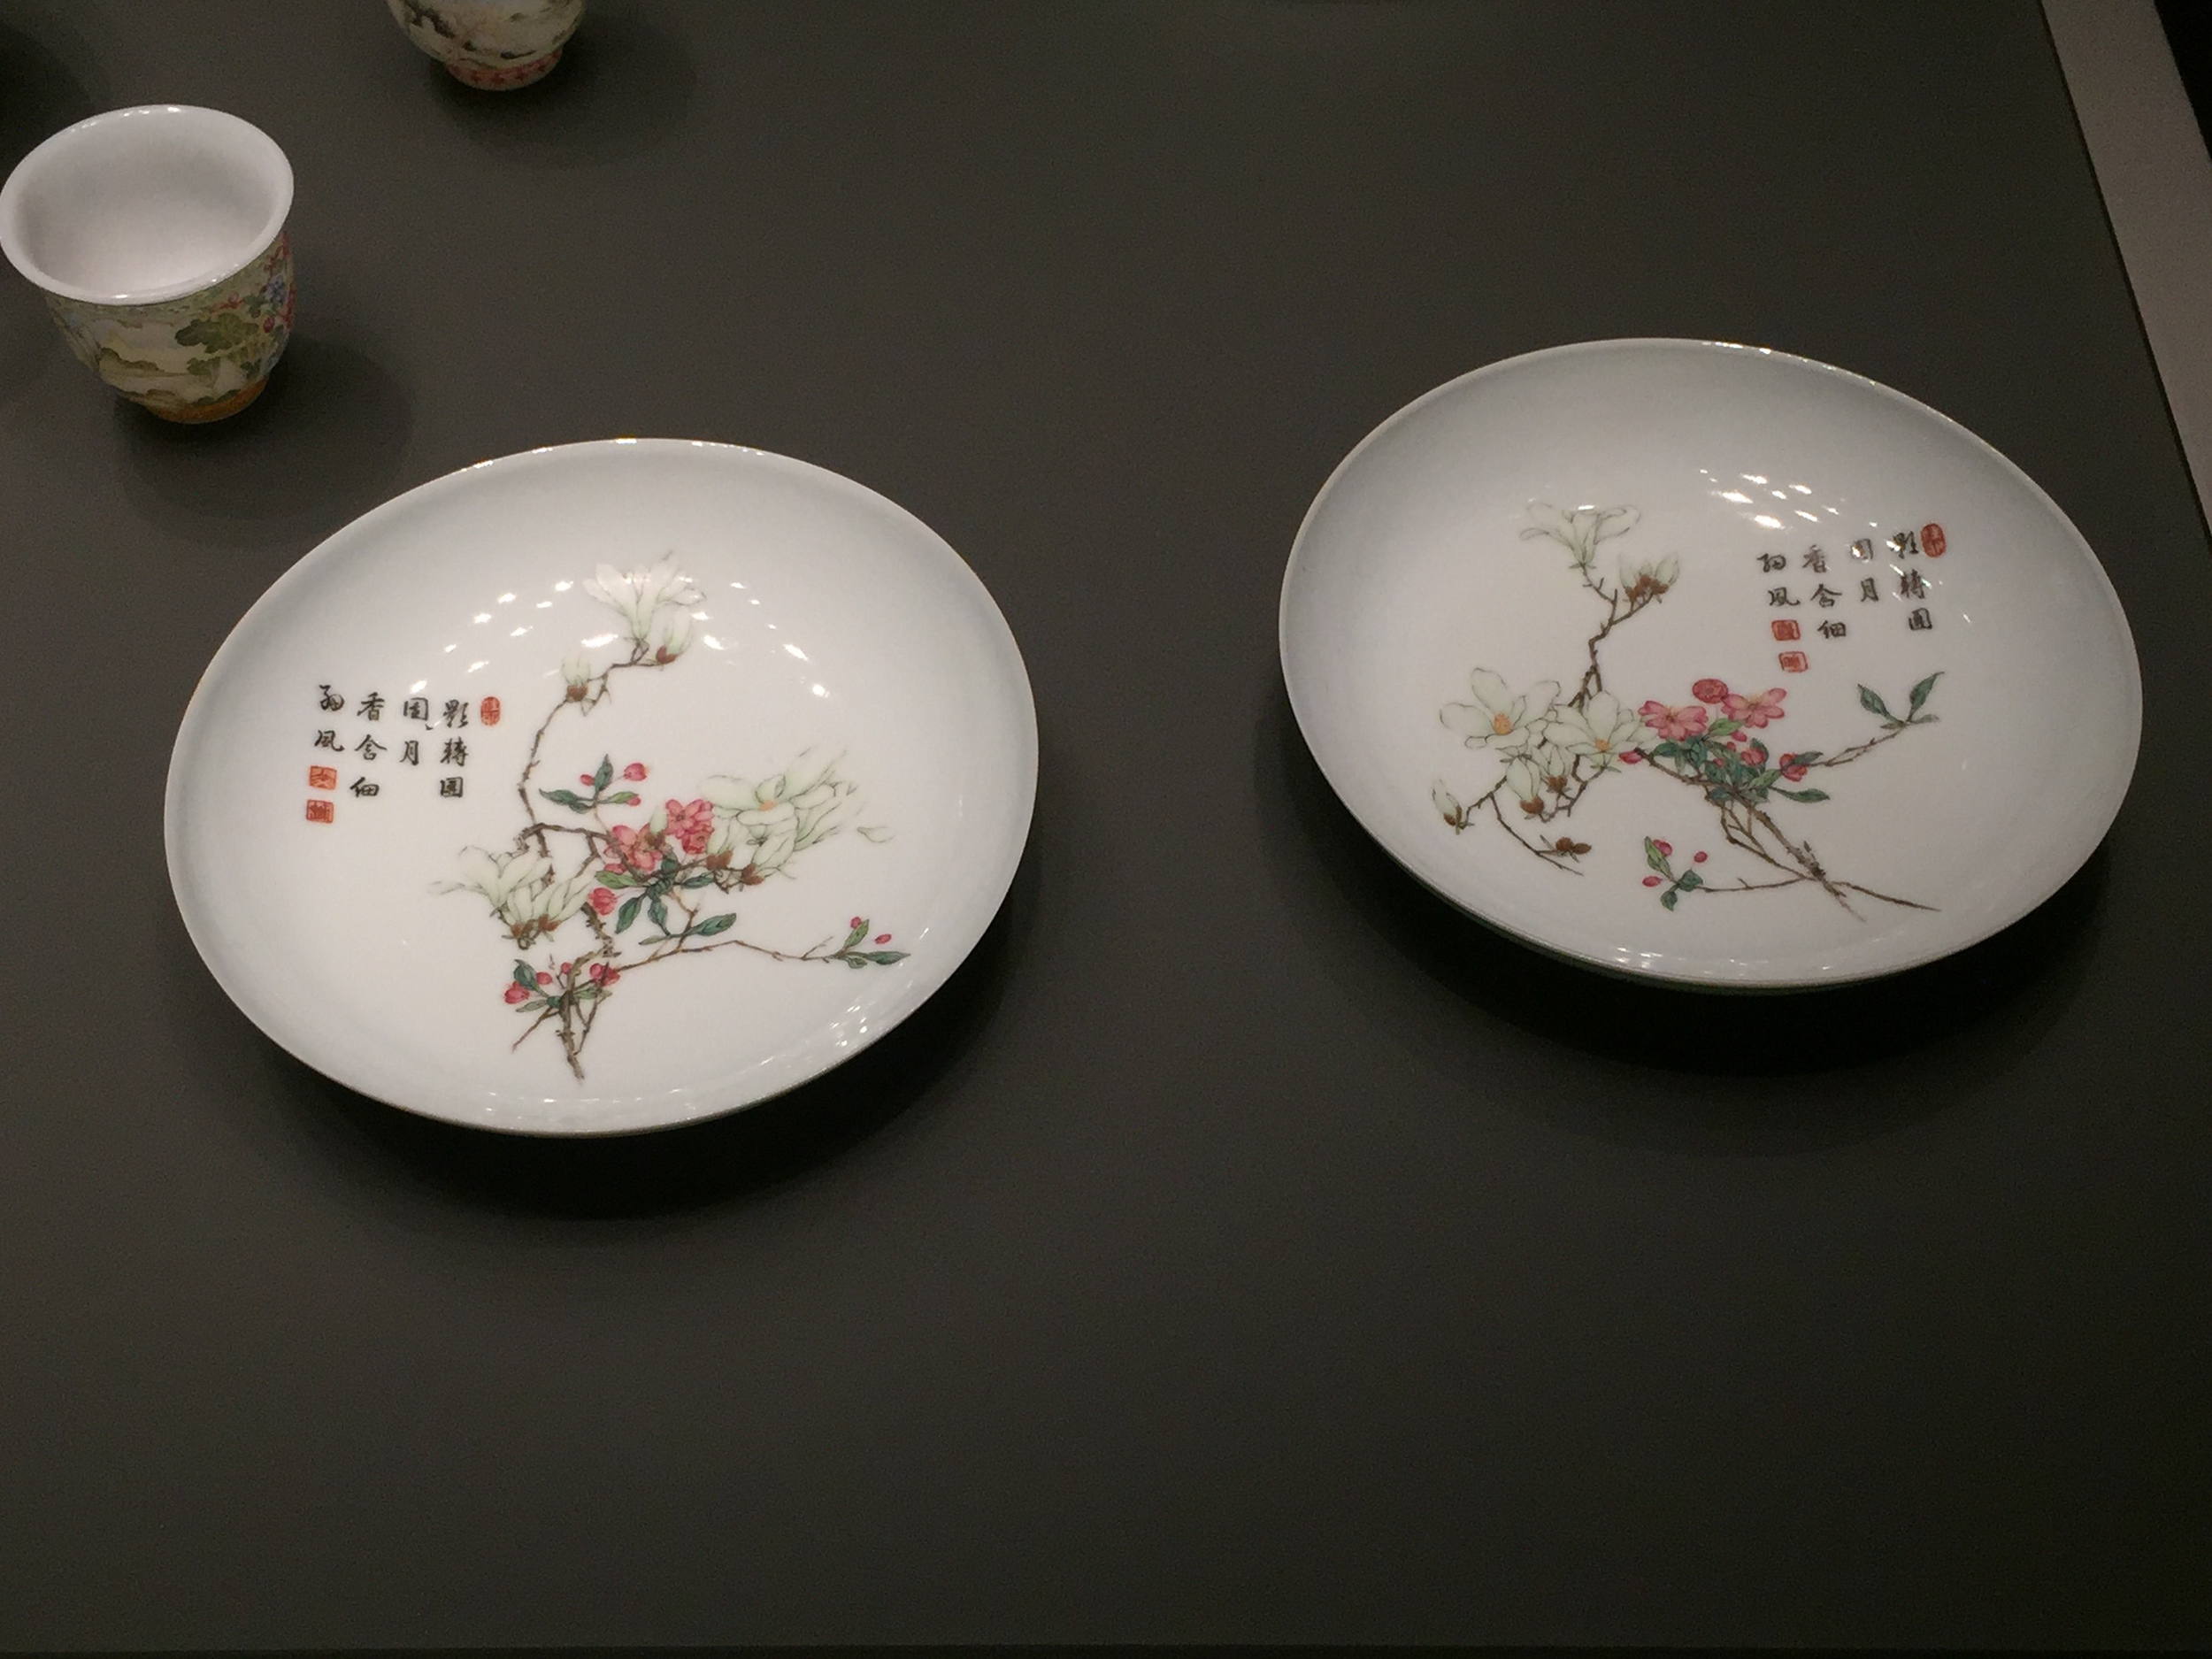 Chinese-Porcelain-British-Museum-Percival-David-jessewaugh.com-142.jpg